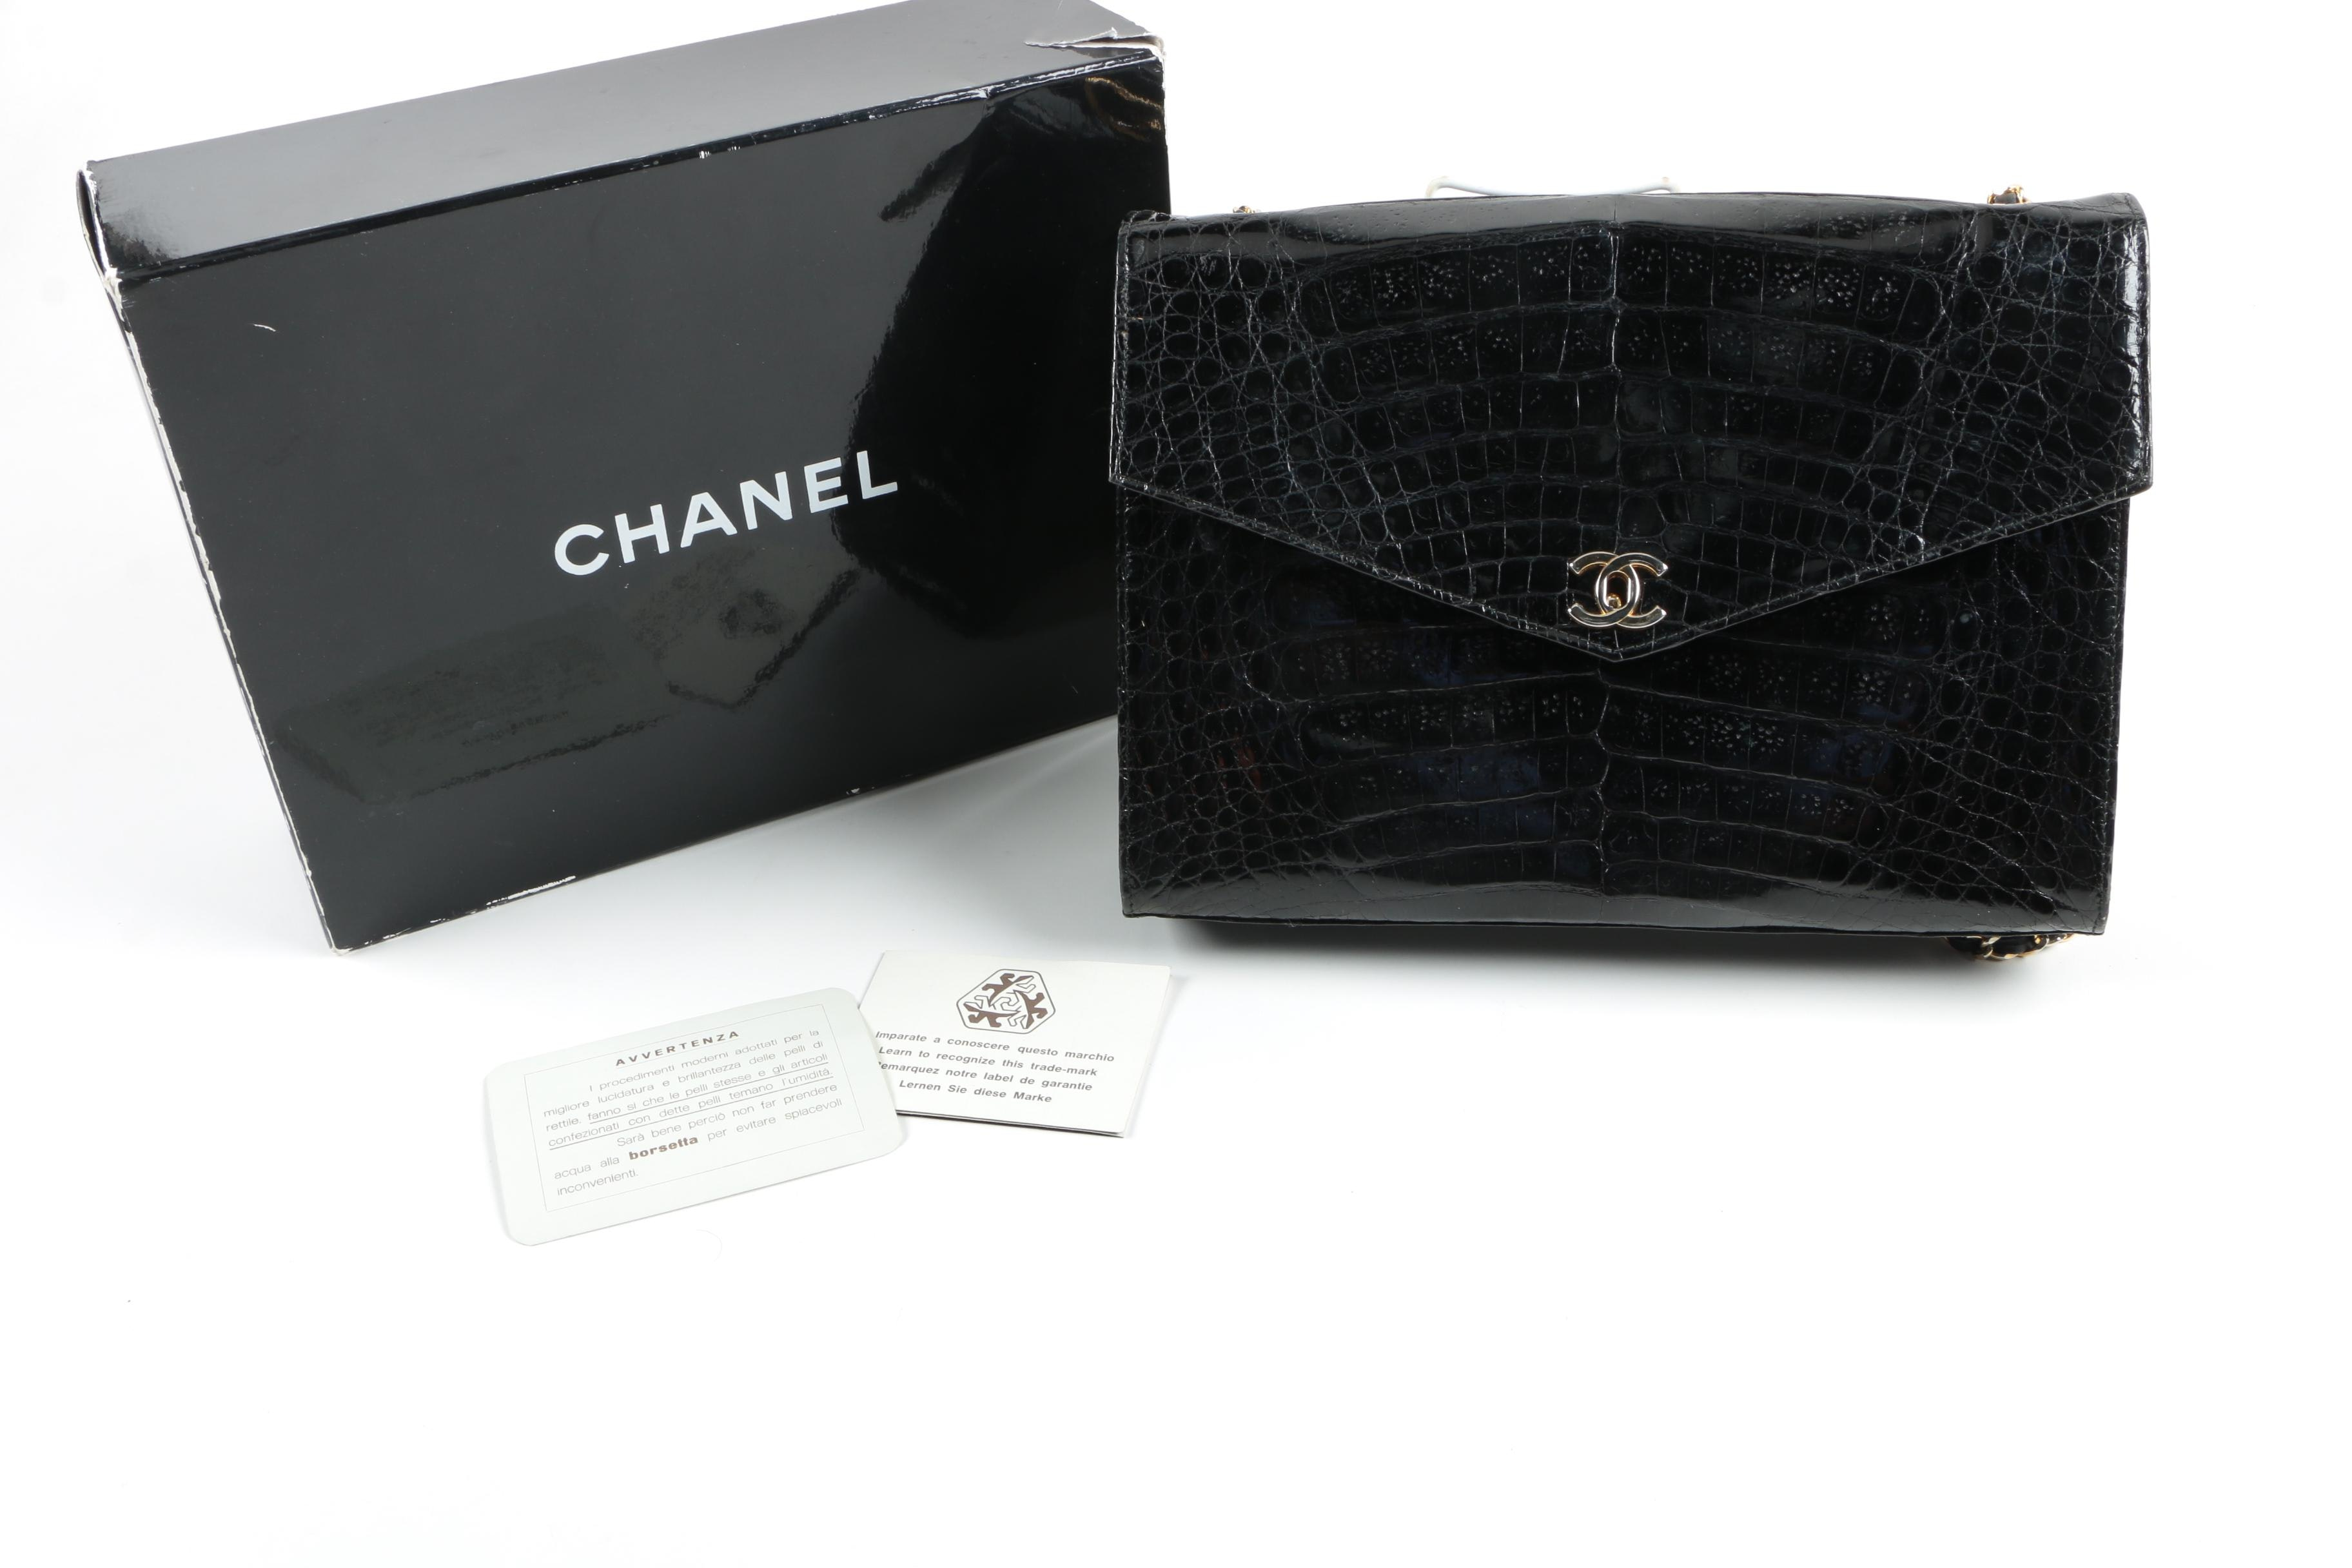 1986-1988 Vintage Chanel Crocodile Skin Handbag